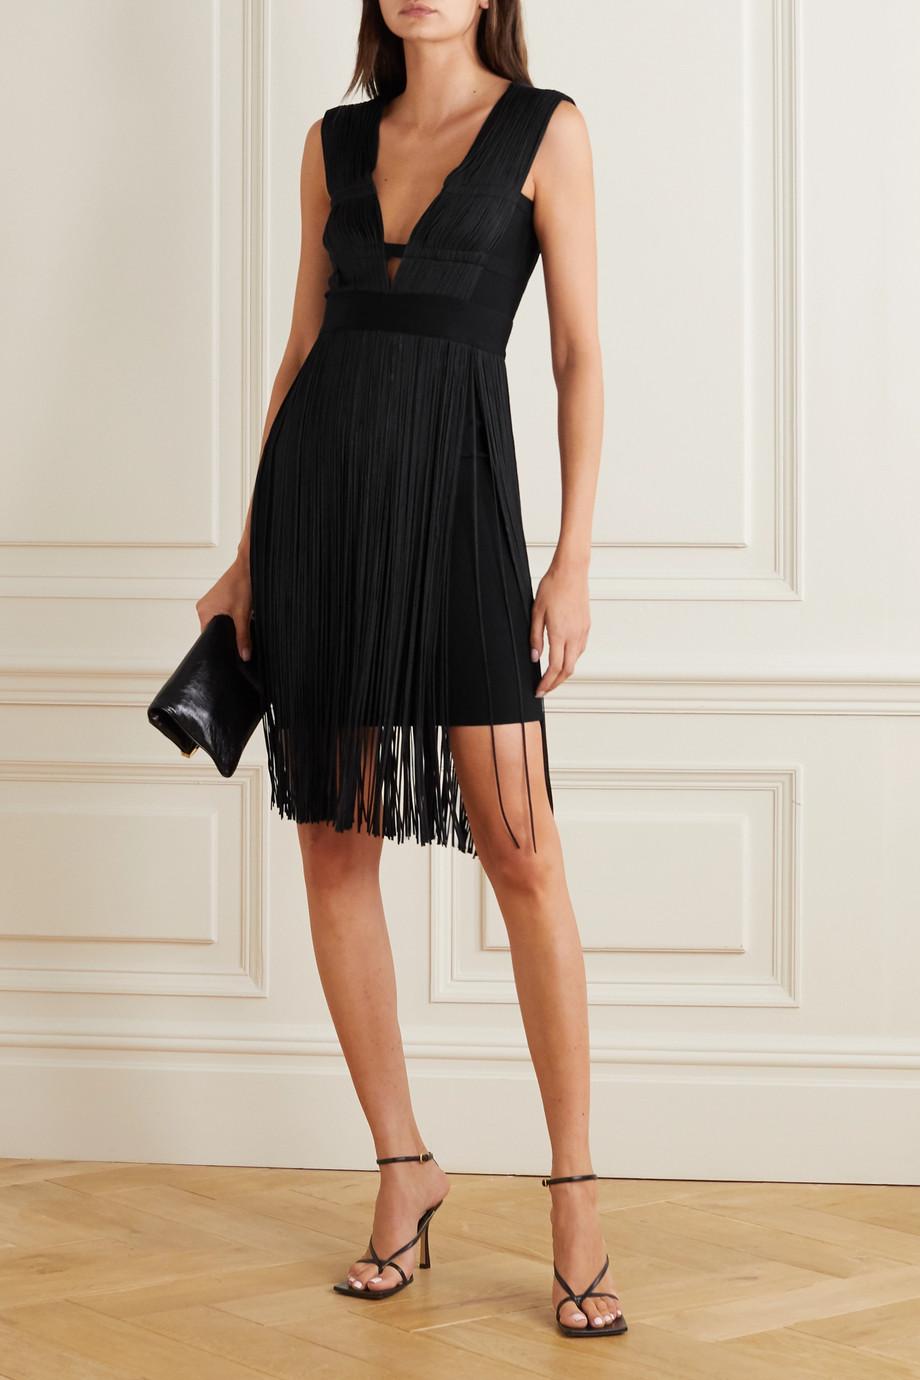 Hervé Léger Fringed cutout stretch-knit dress